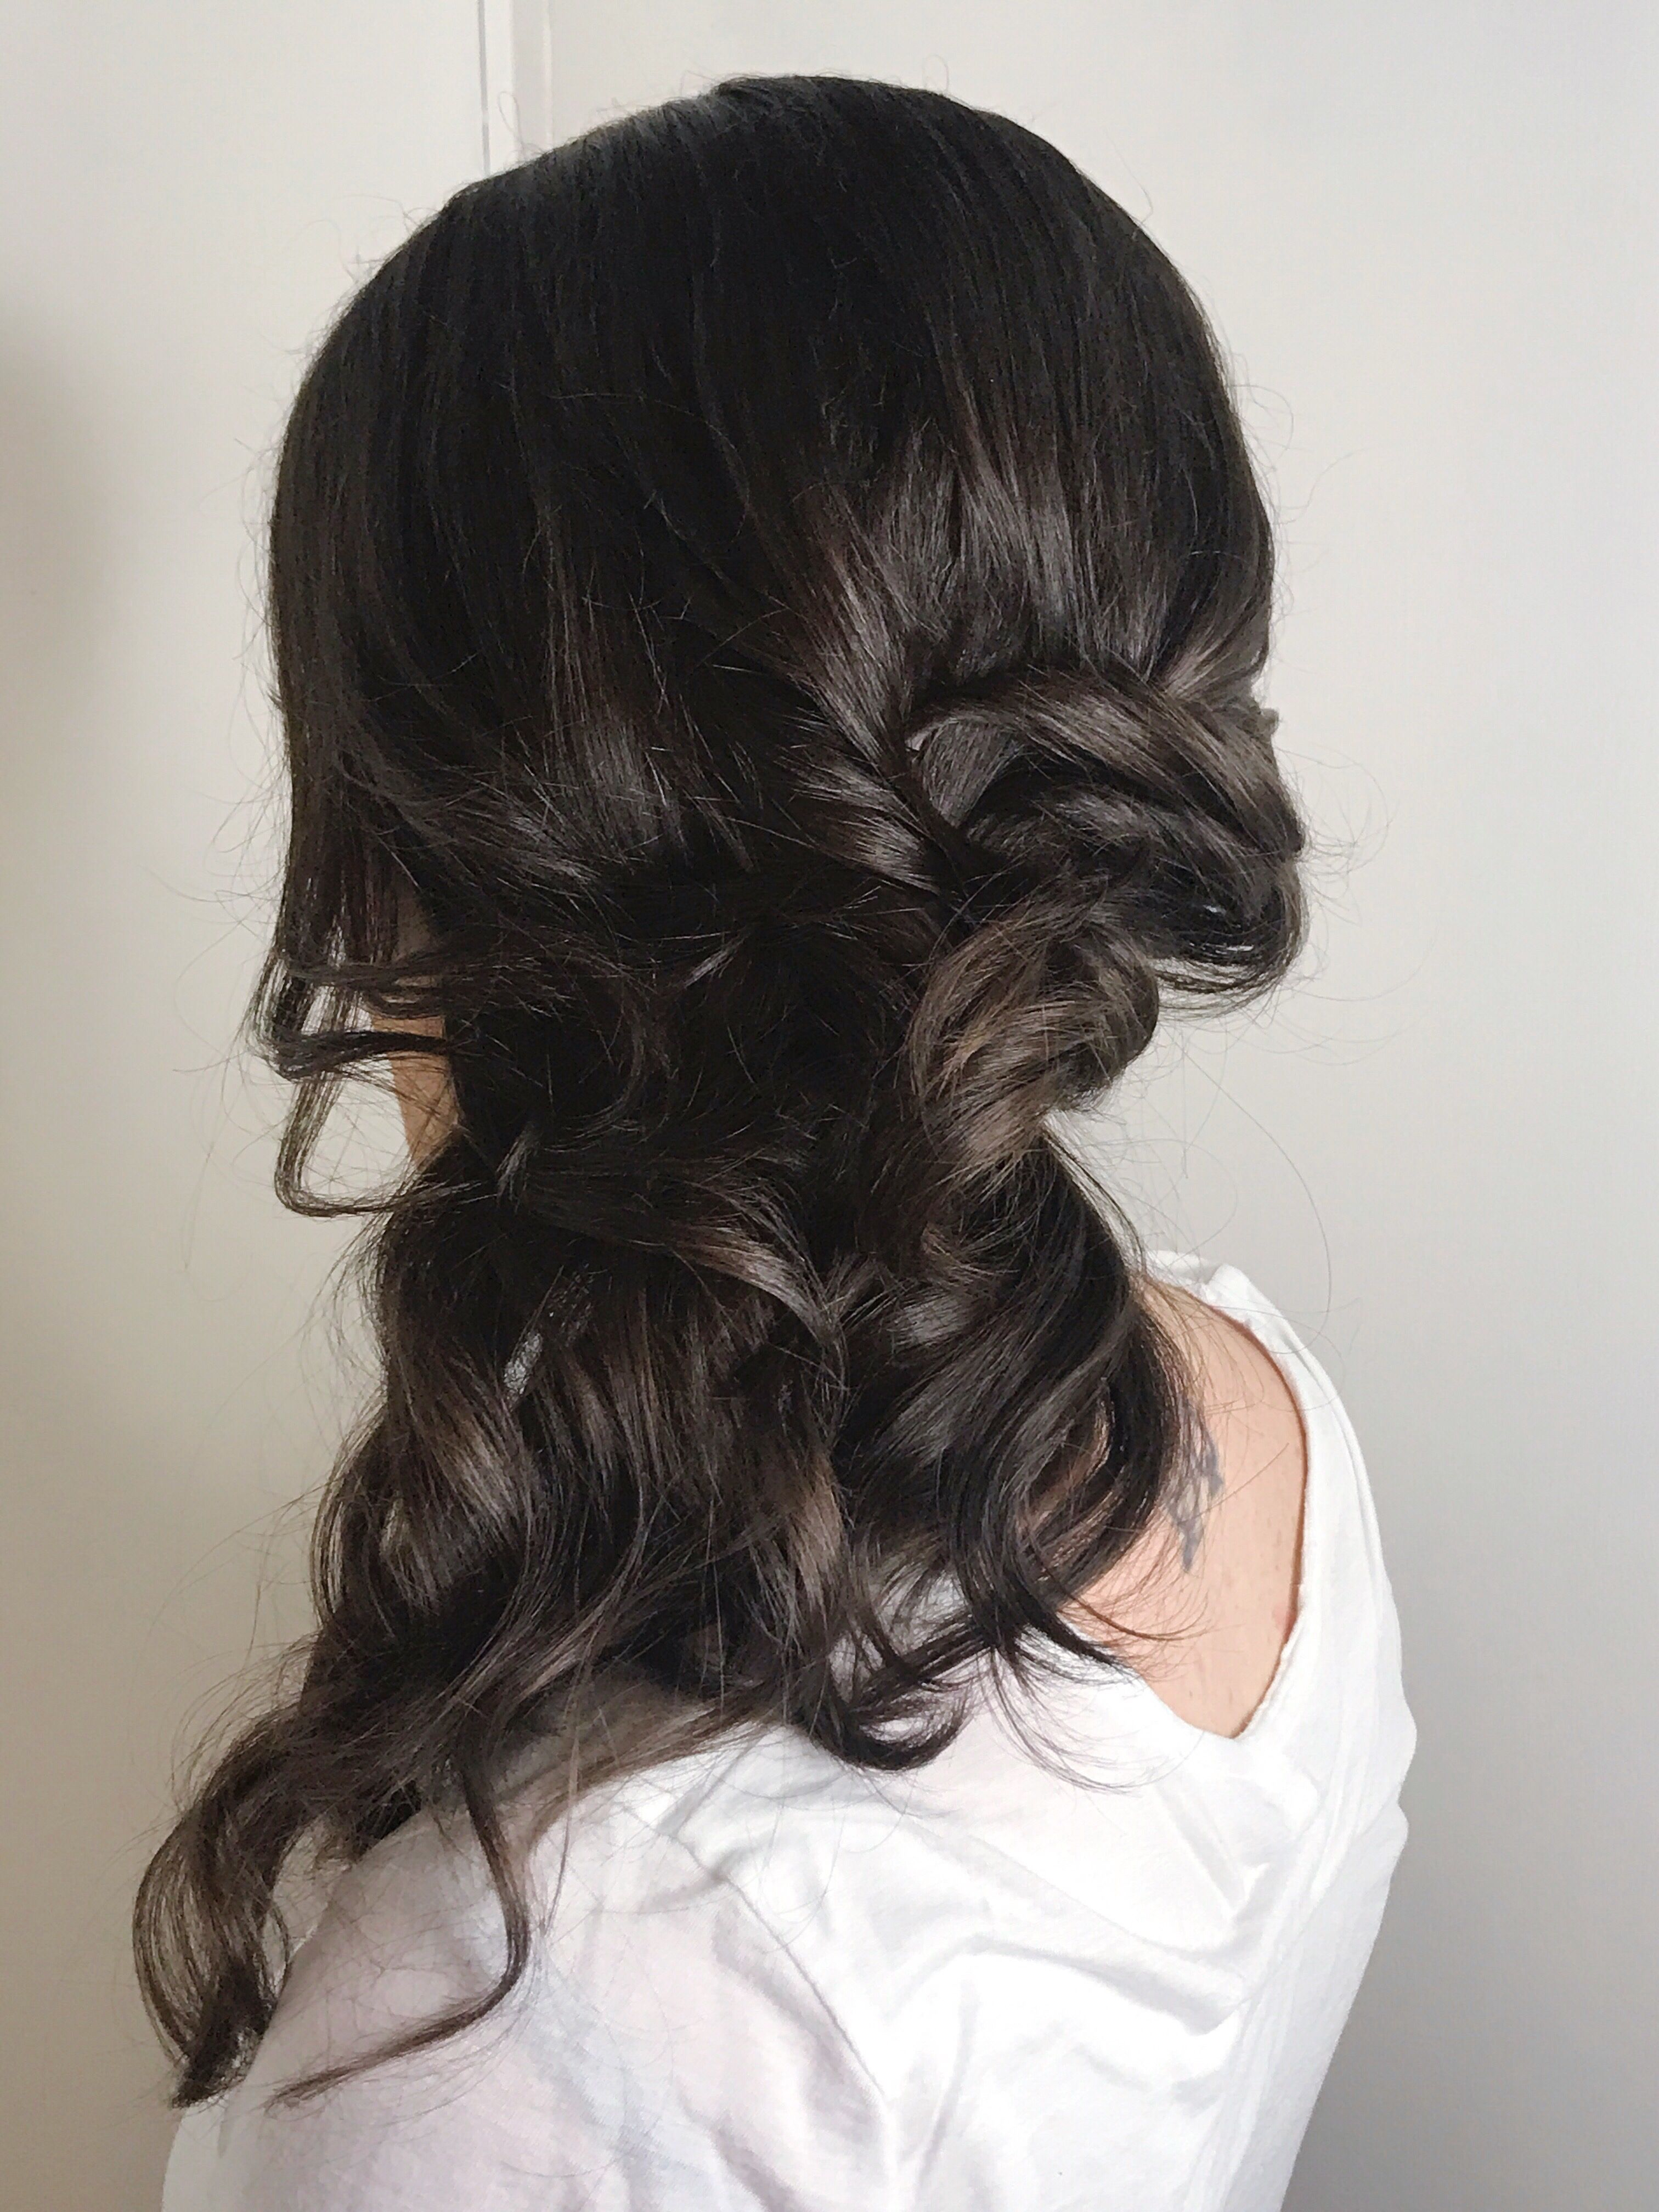 Effortless Bridal Hair For Summer Wedding Messy Updo Half Up